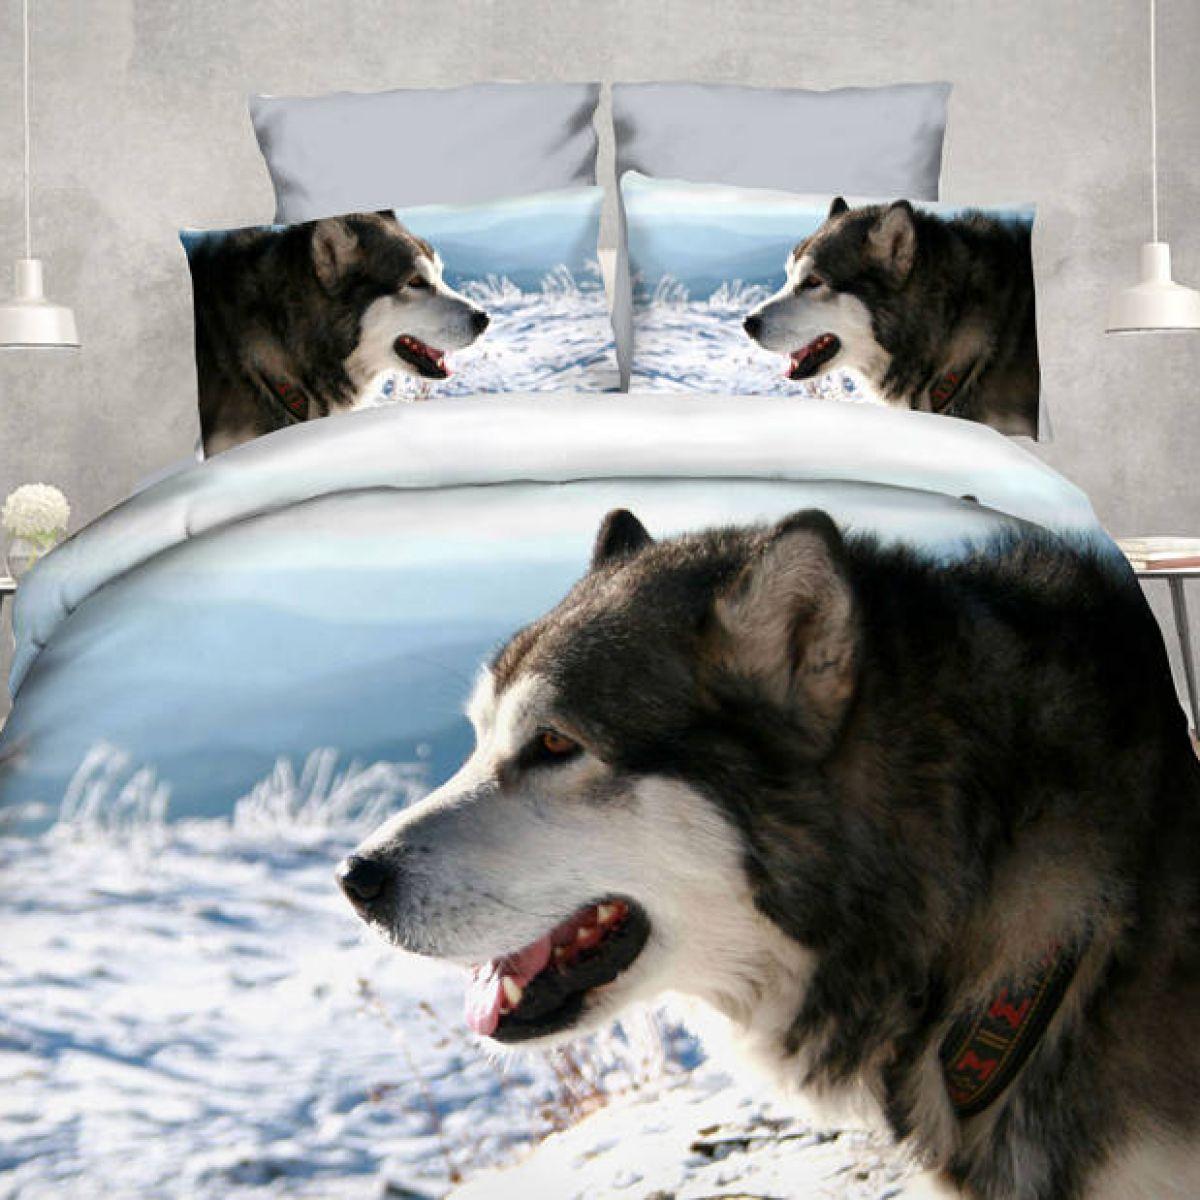 3D Beddings - Antonio - AML-30 - 160x200 cm - 4 pcs